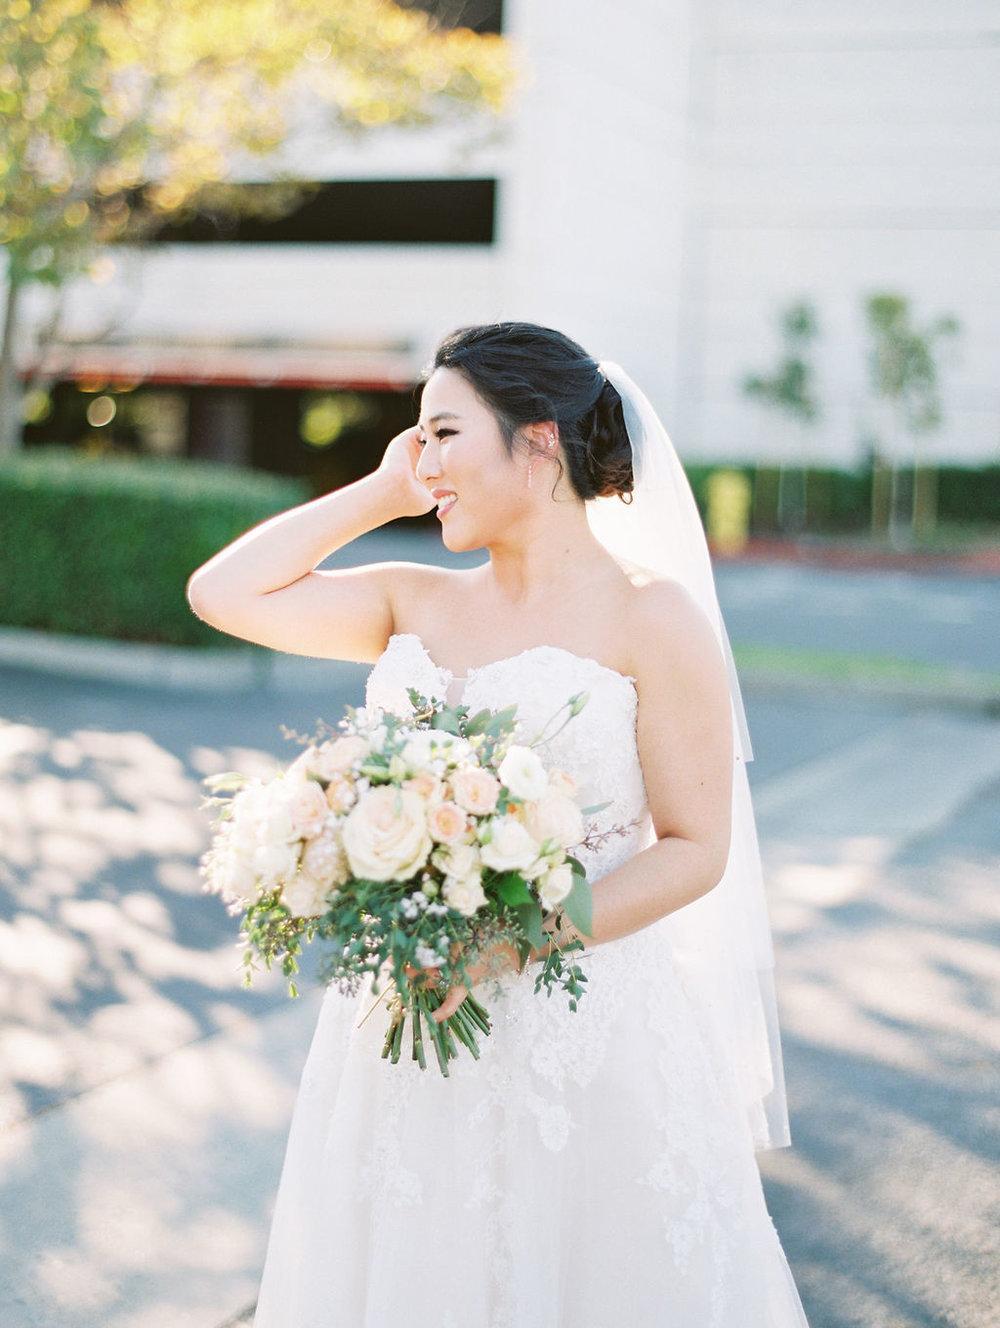 JennySoiPhotography-S&SSFAirportWeddingBrideandGroom-119.jpgSan Francisco Fairmont Hotel Wedding Fine Art Film Wedding Photographer